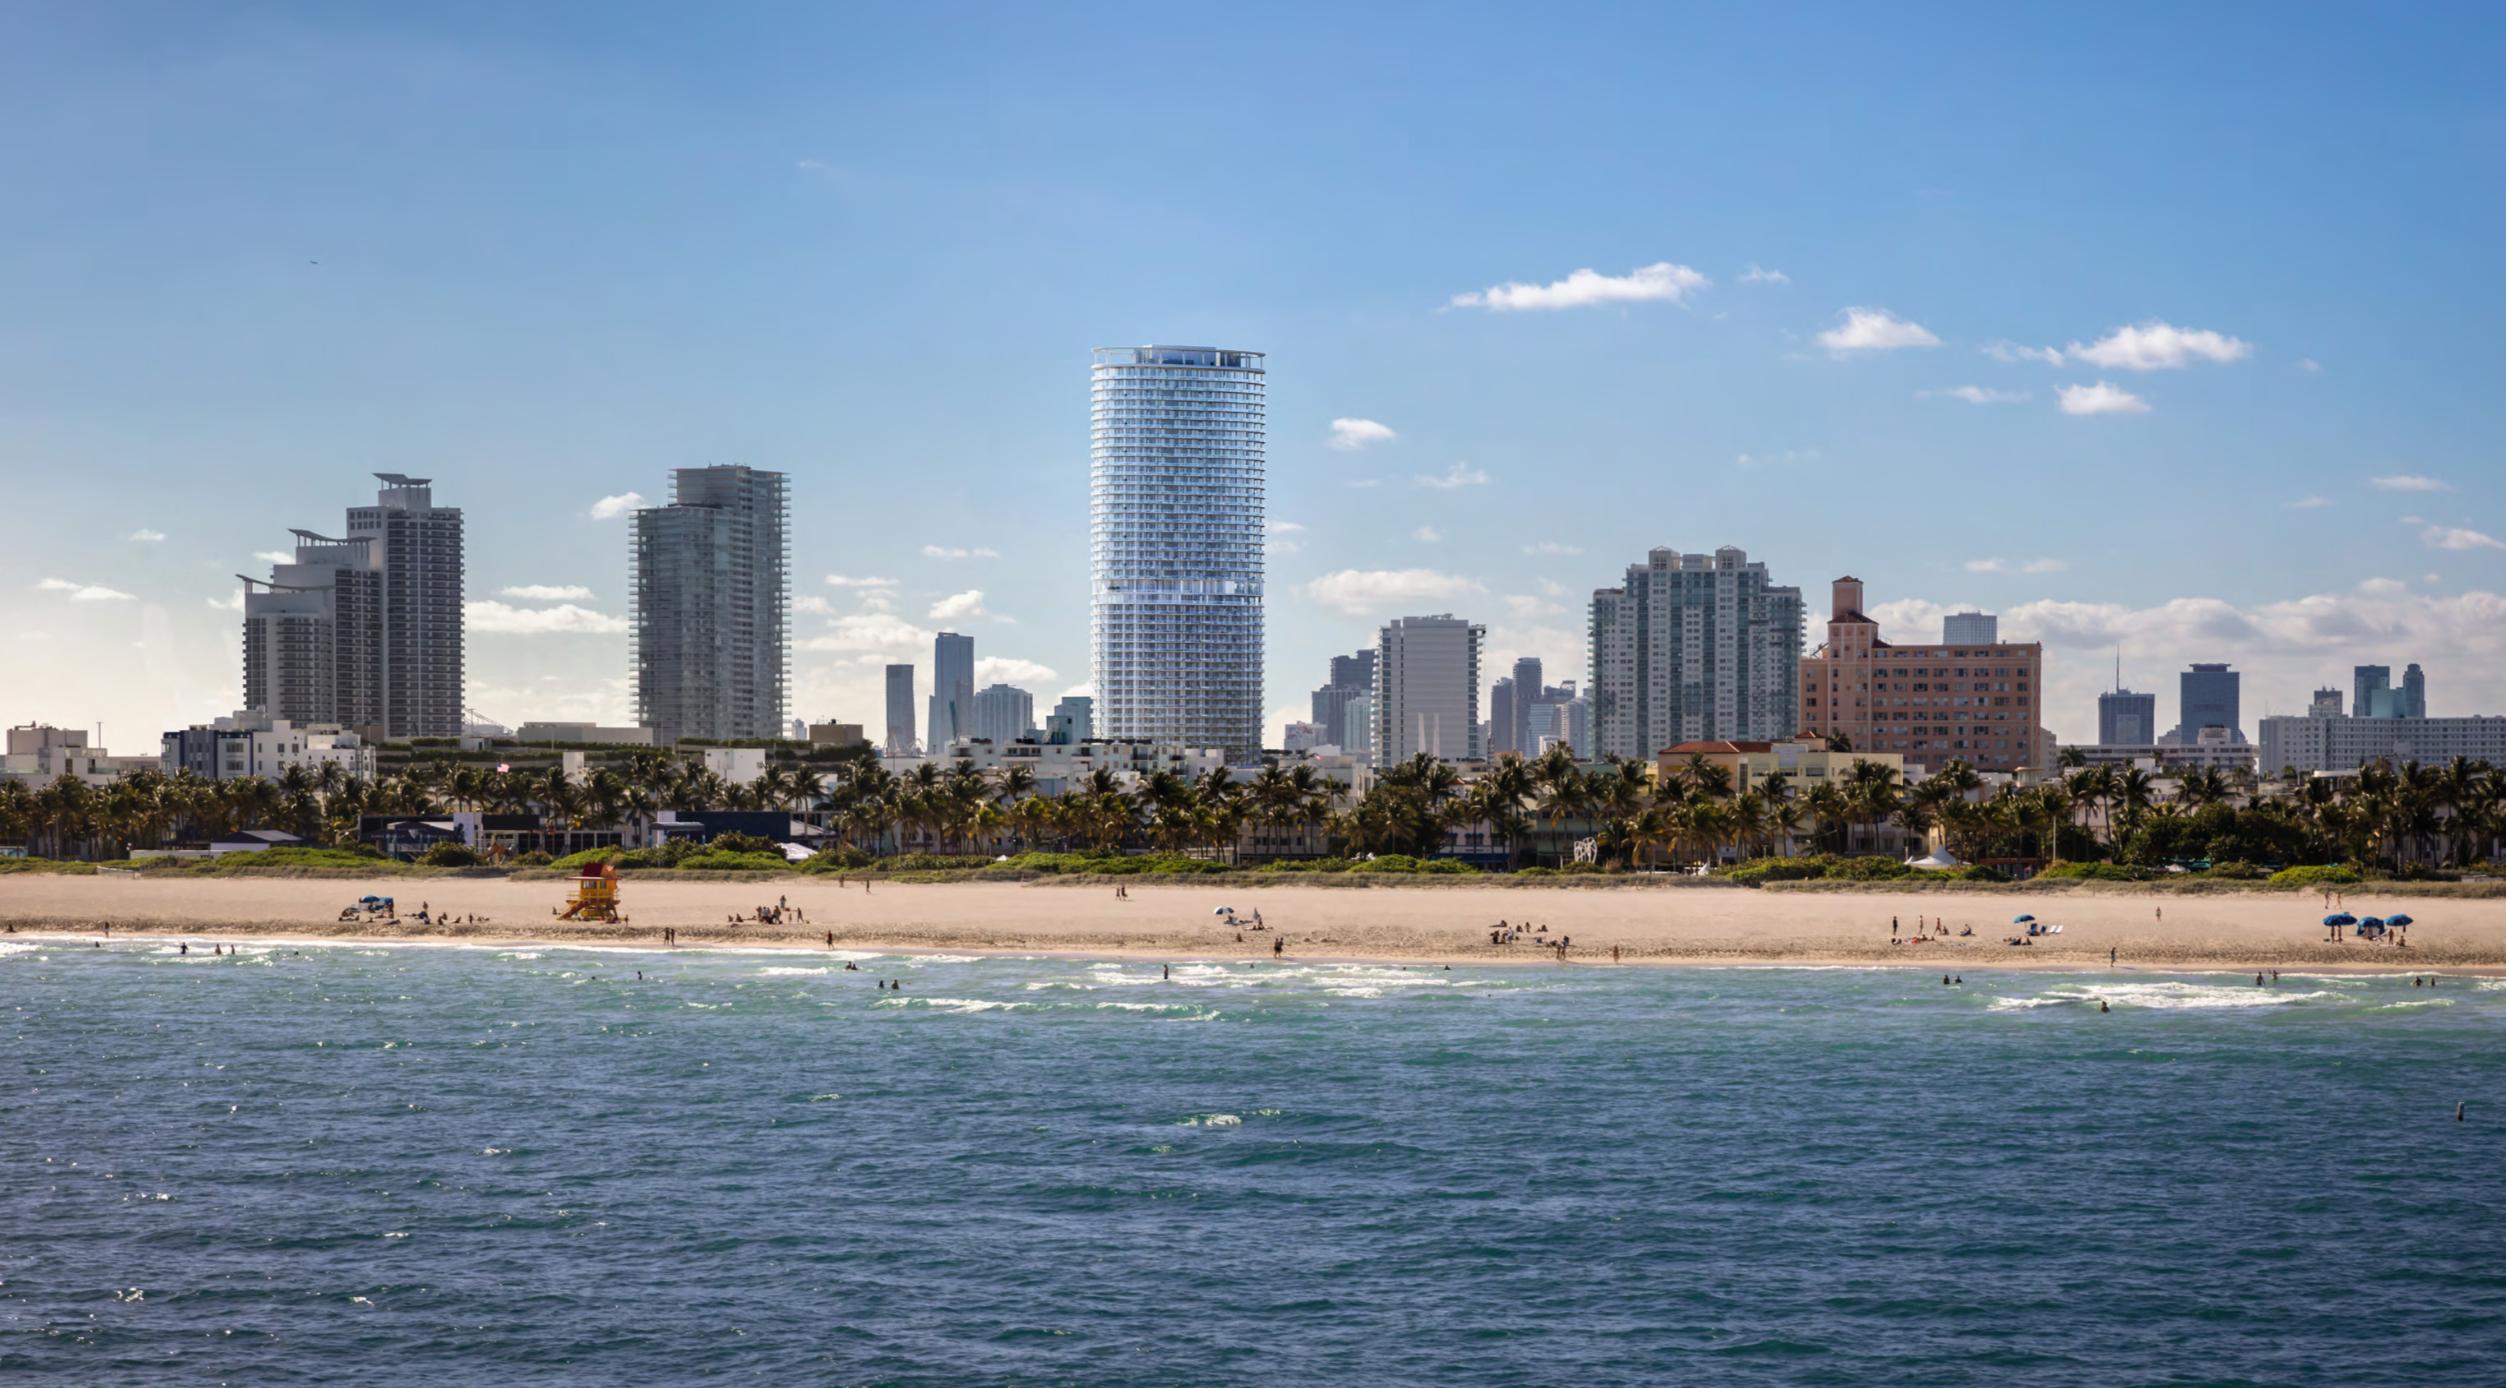 Five Park Miami Beach | Is This The Best New Condo In Miami Beach?